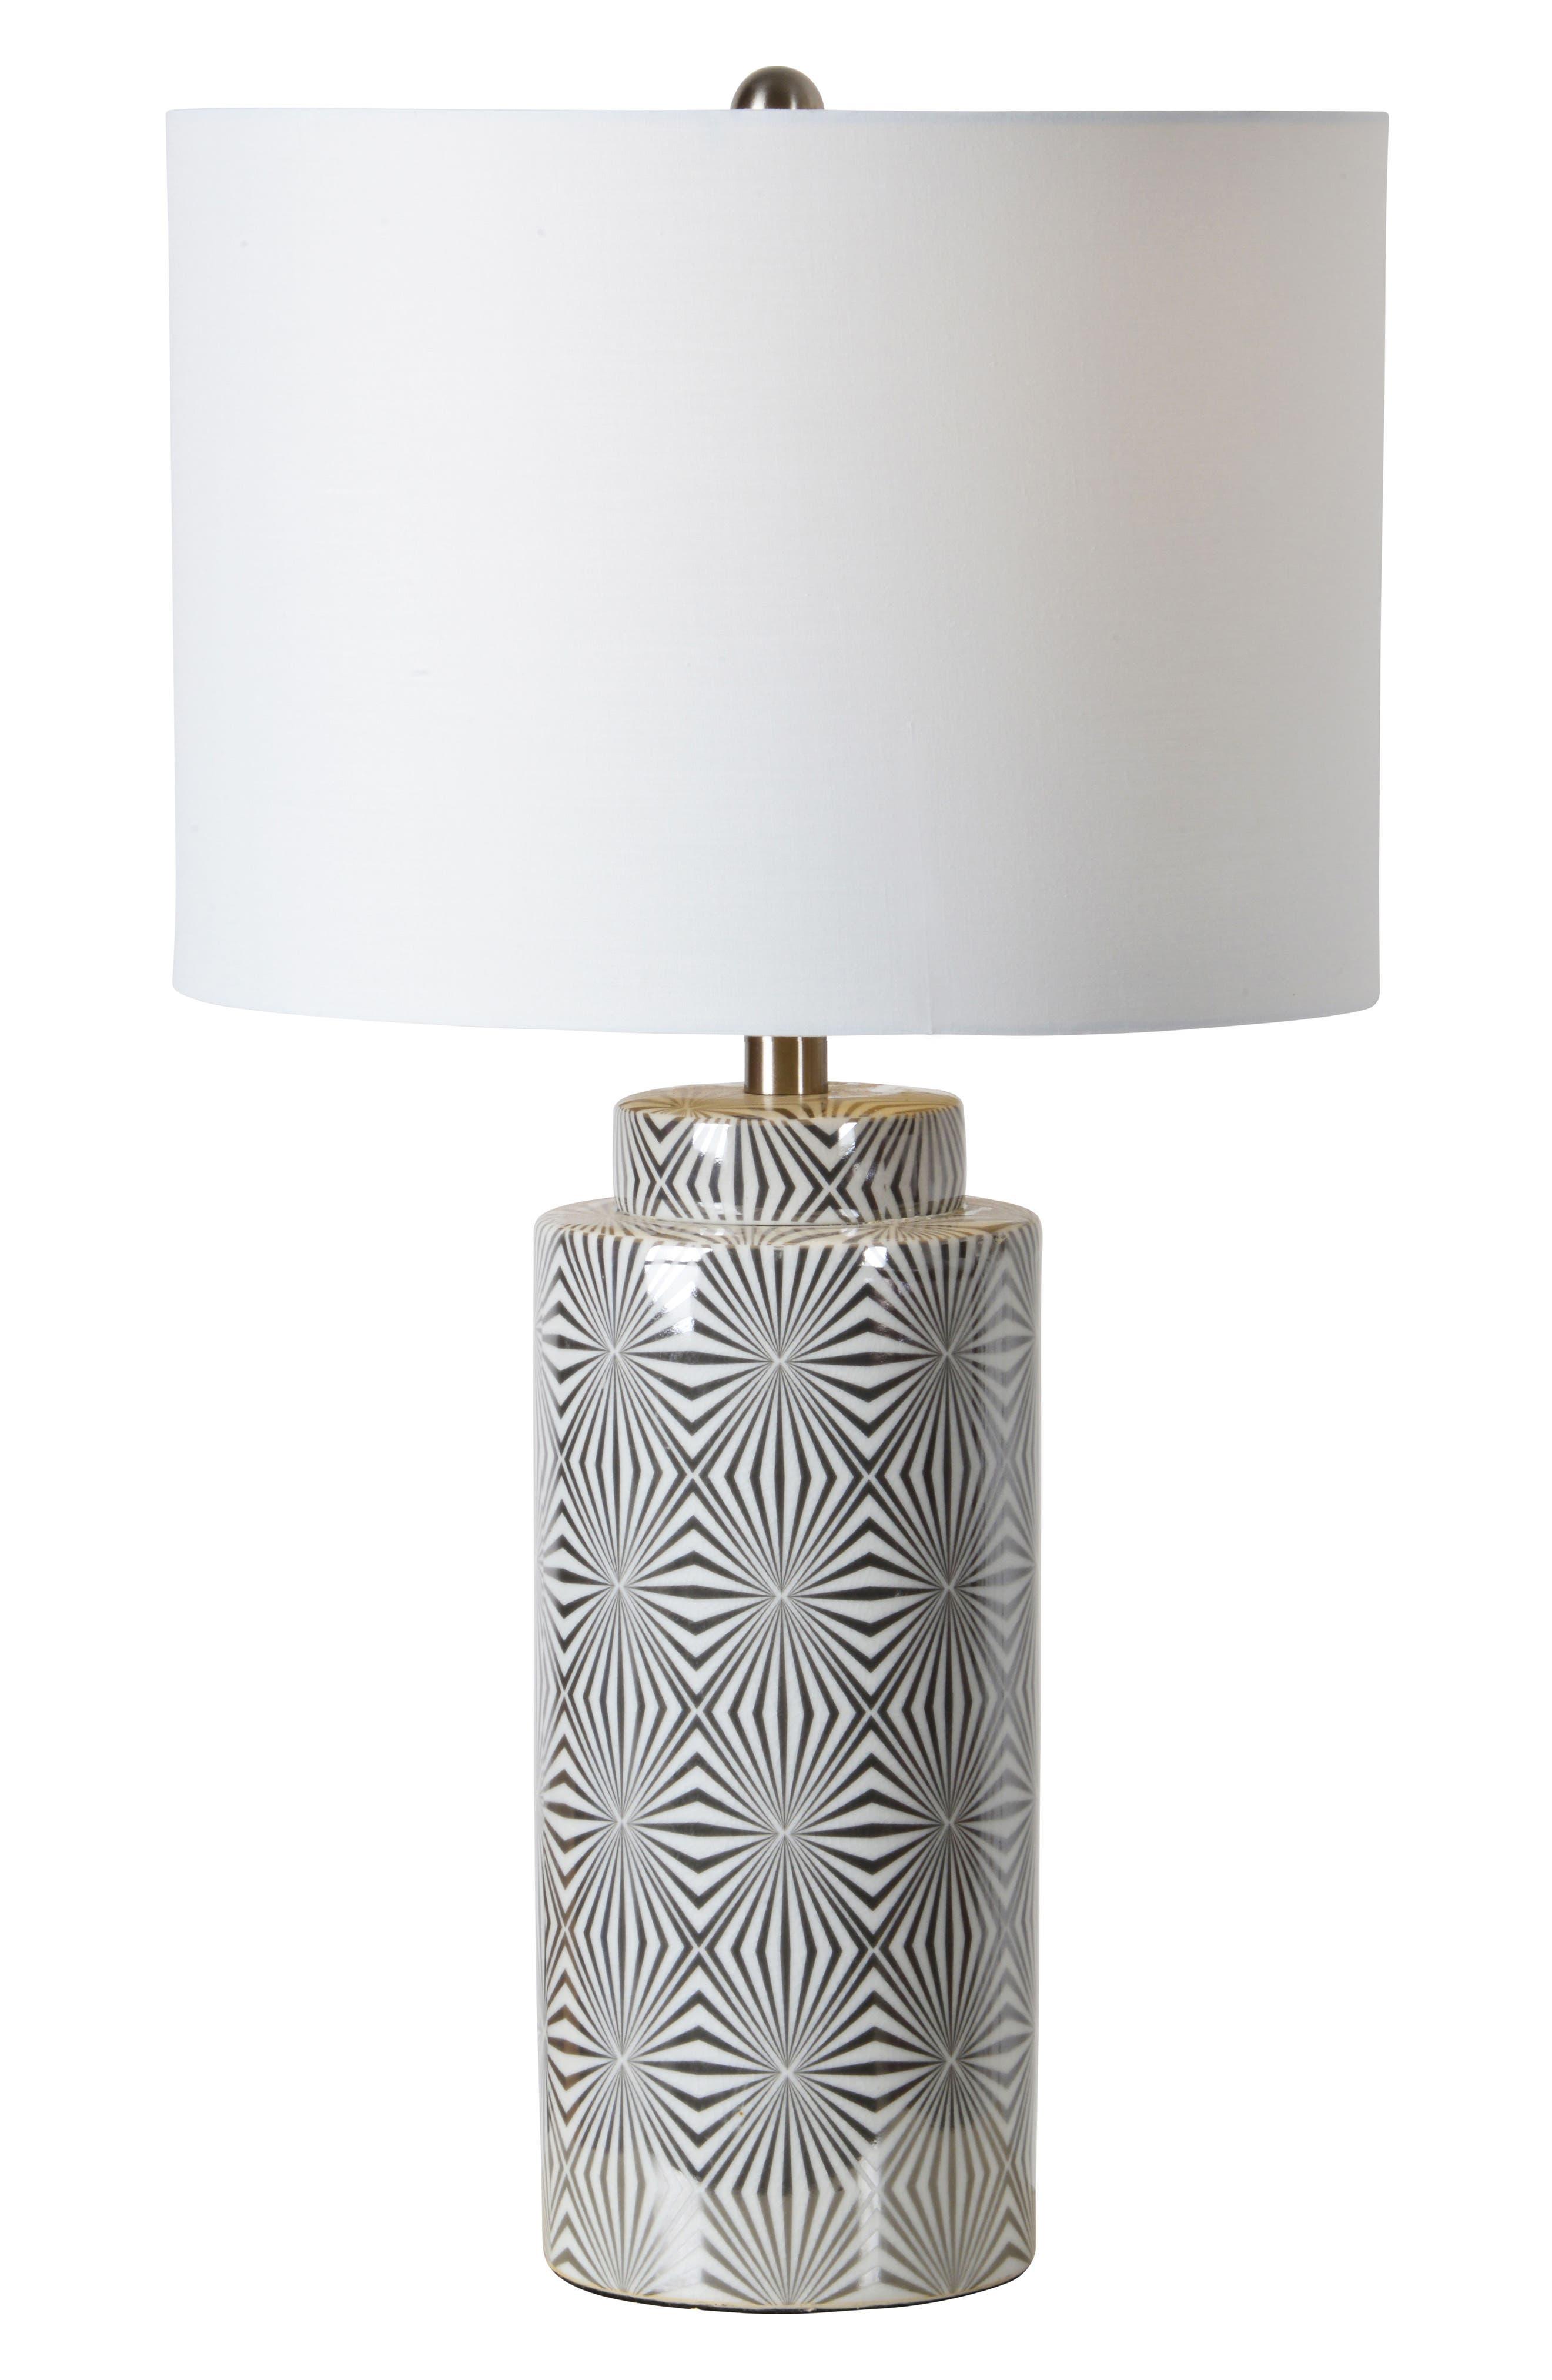 Camden Table Lamp,                             Main thumbnail 1, color,                             040